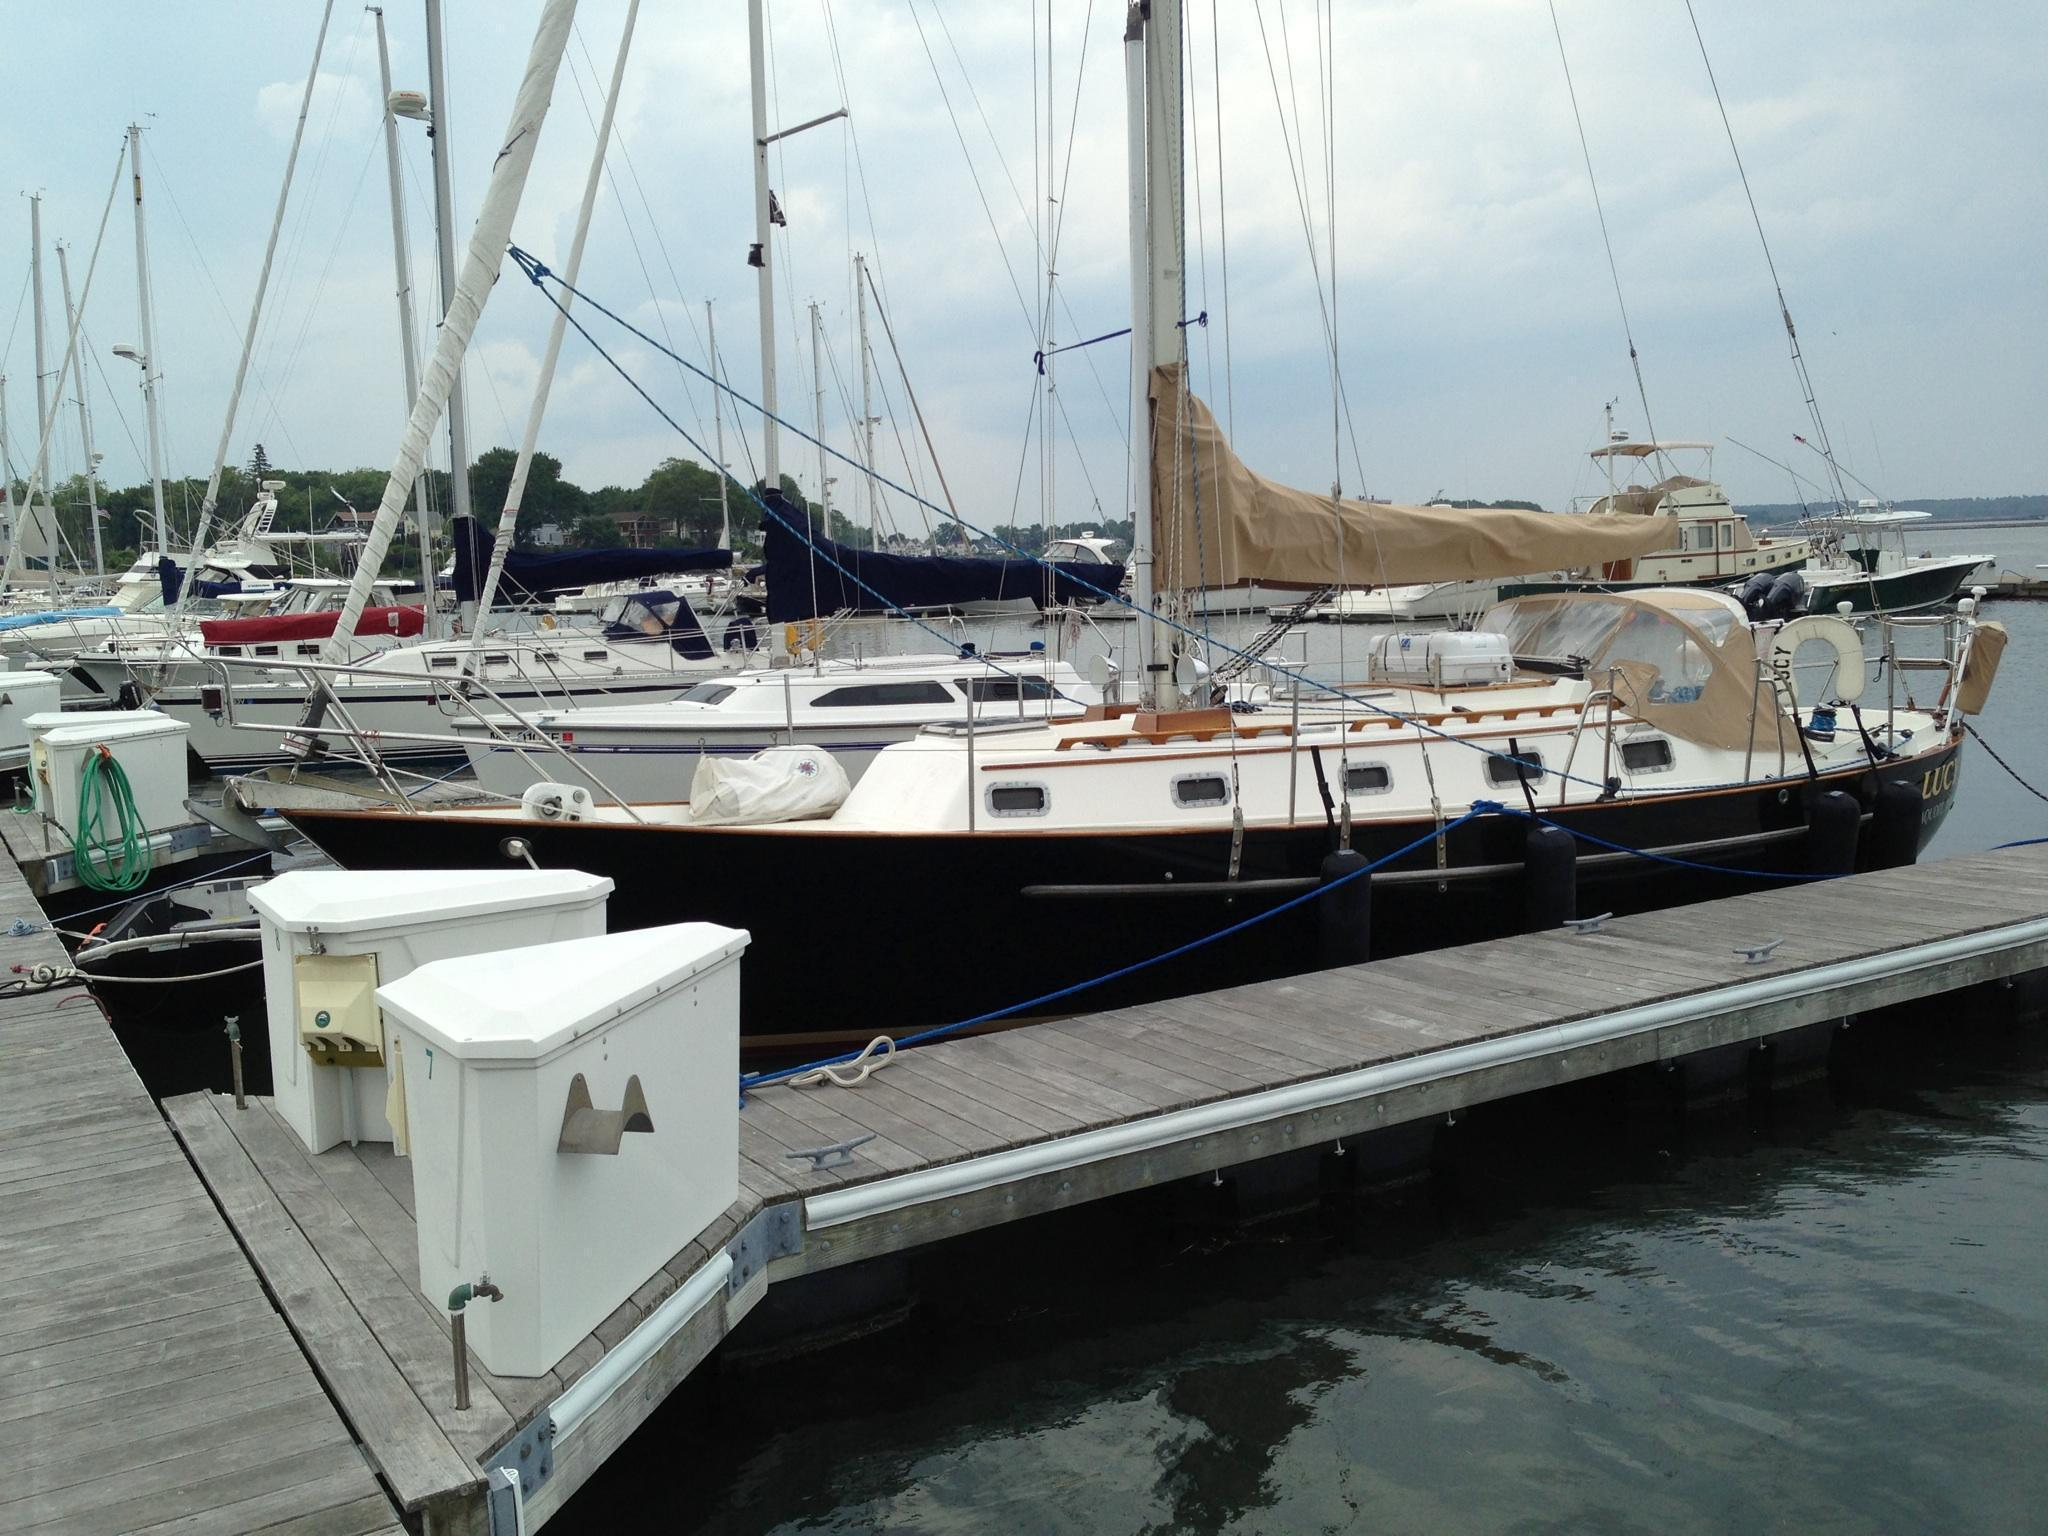 Pacific Seacraft Crealock 34, Rockport